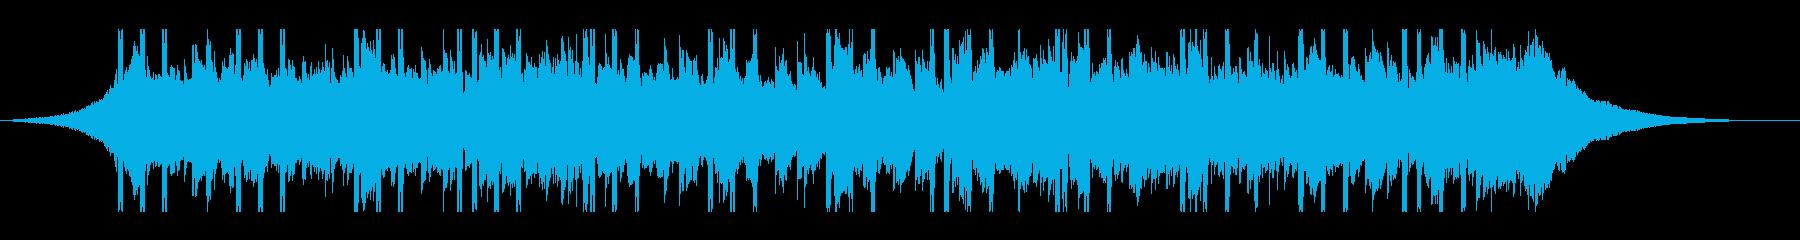 Technologies (30 Sec)'s reproduced waveform